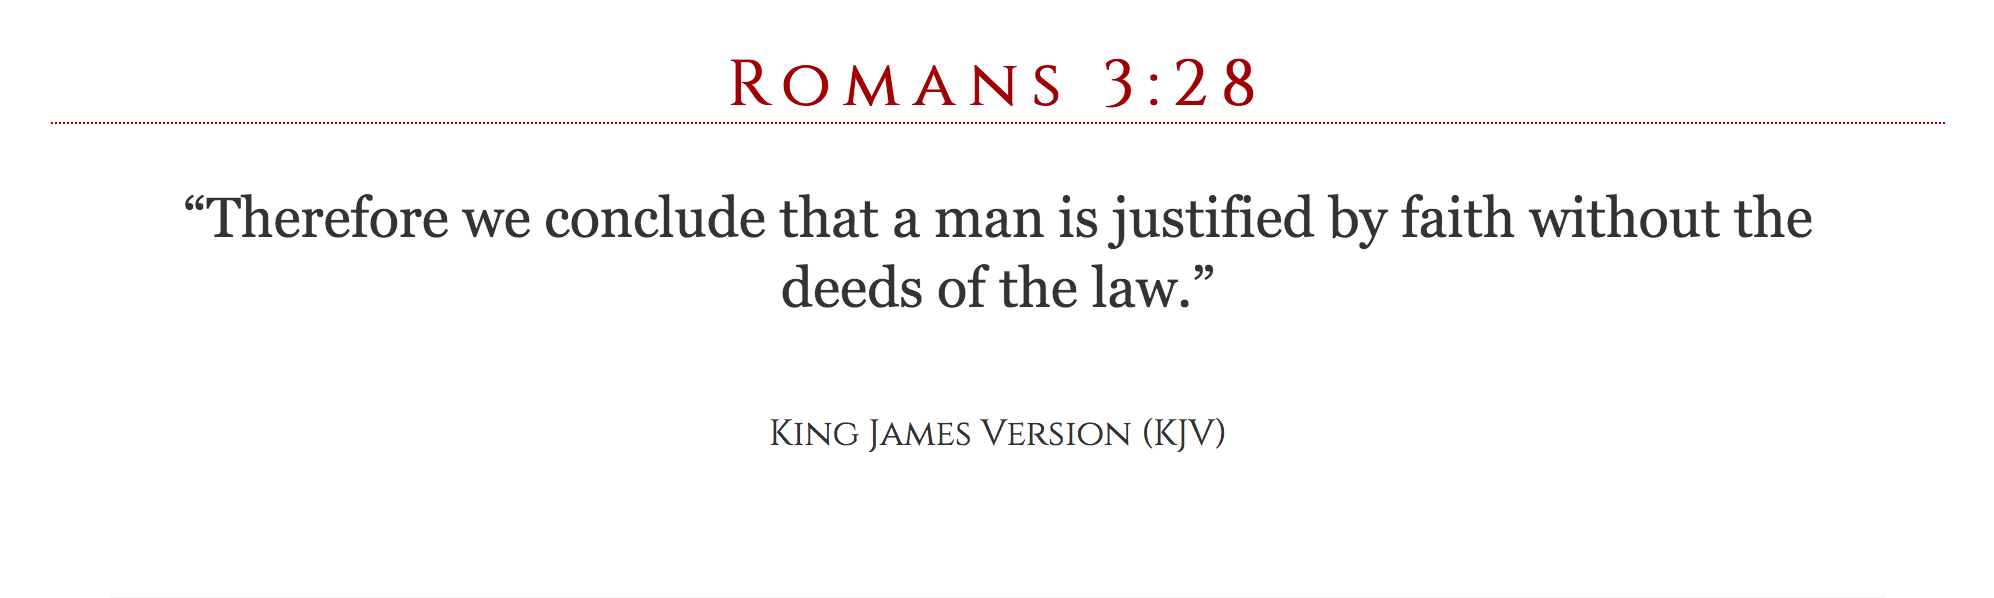 Romans 3:28